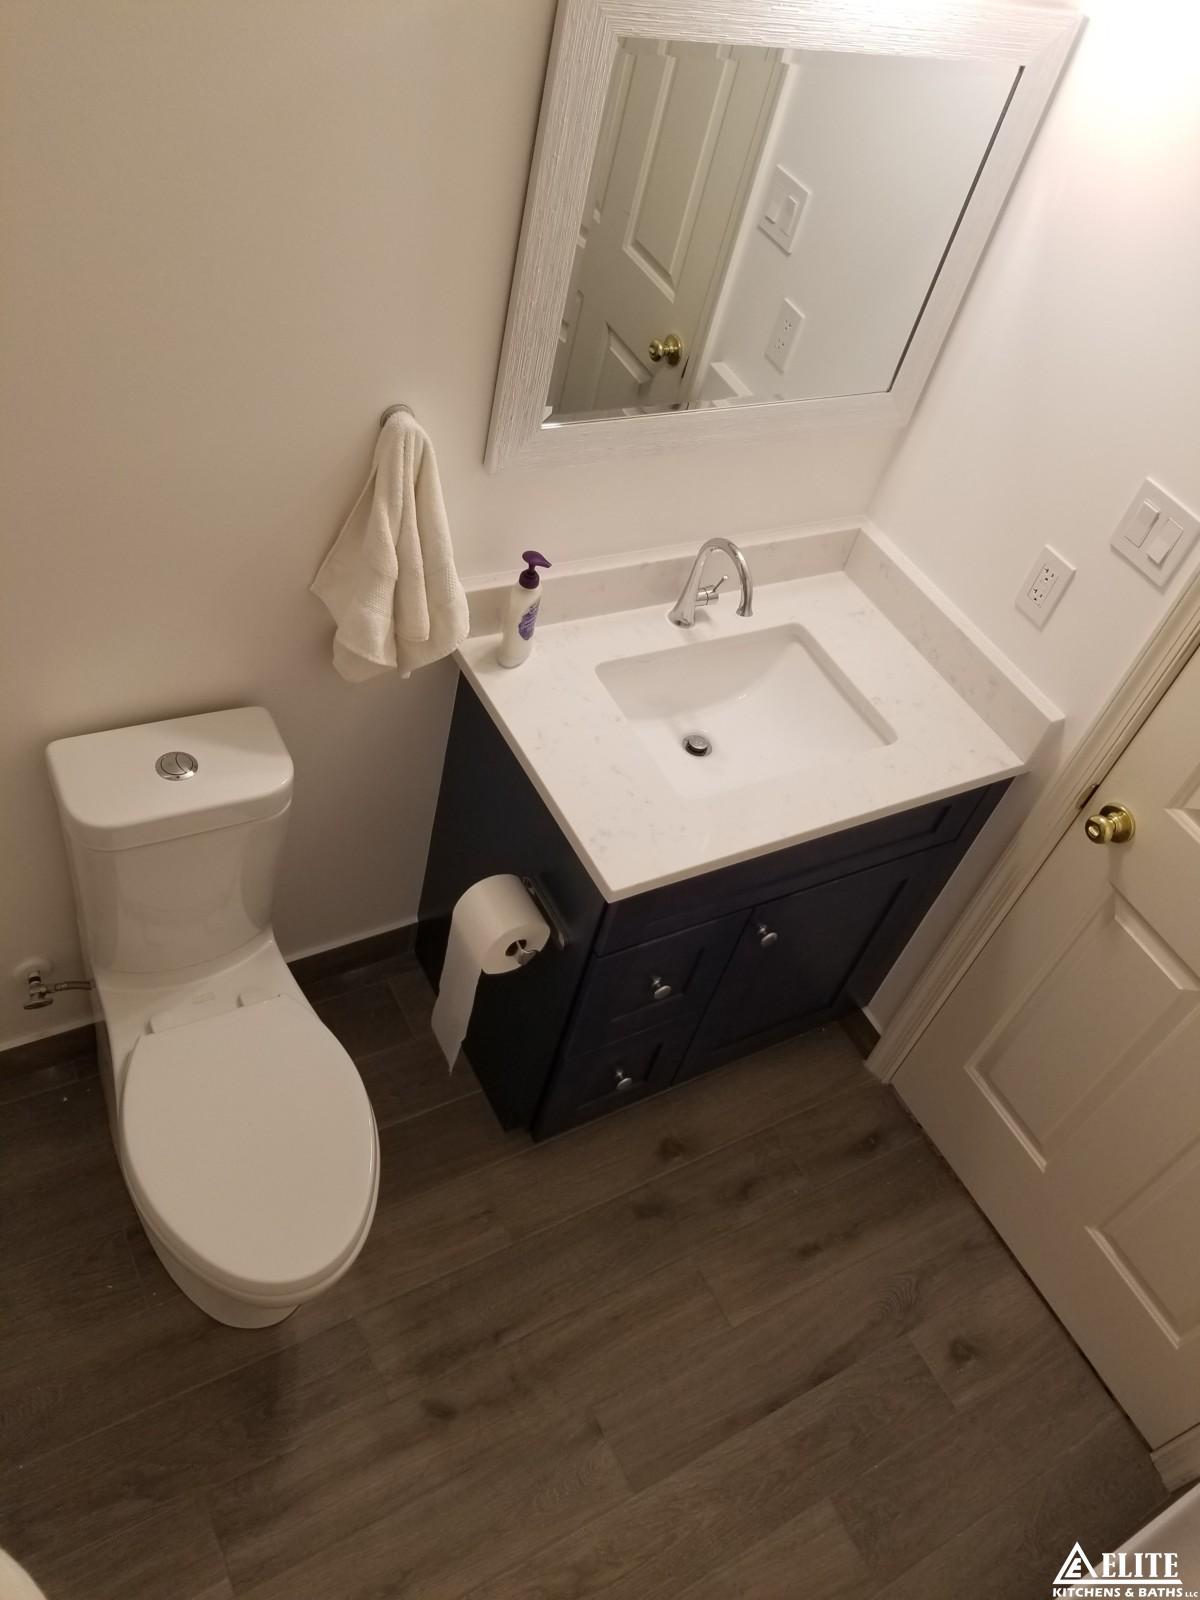 Bathrooms 78